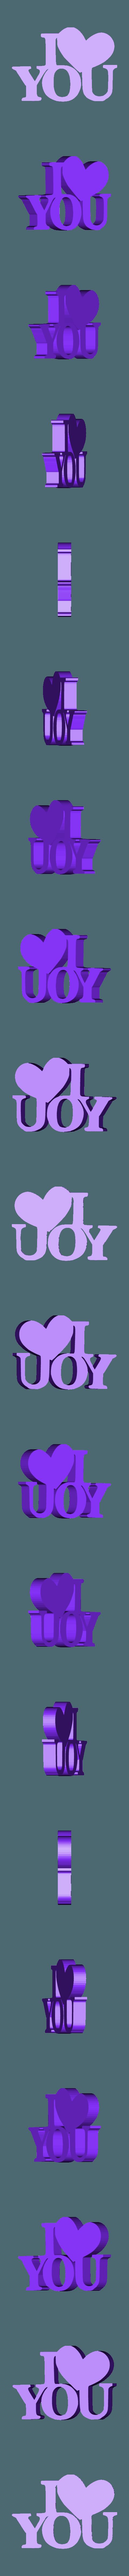 iloveyou.STL Download free STL file <font color=#38B0DE>-==- Proudly Presents • Model to 3D print, allv